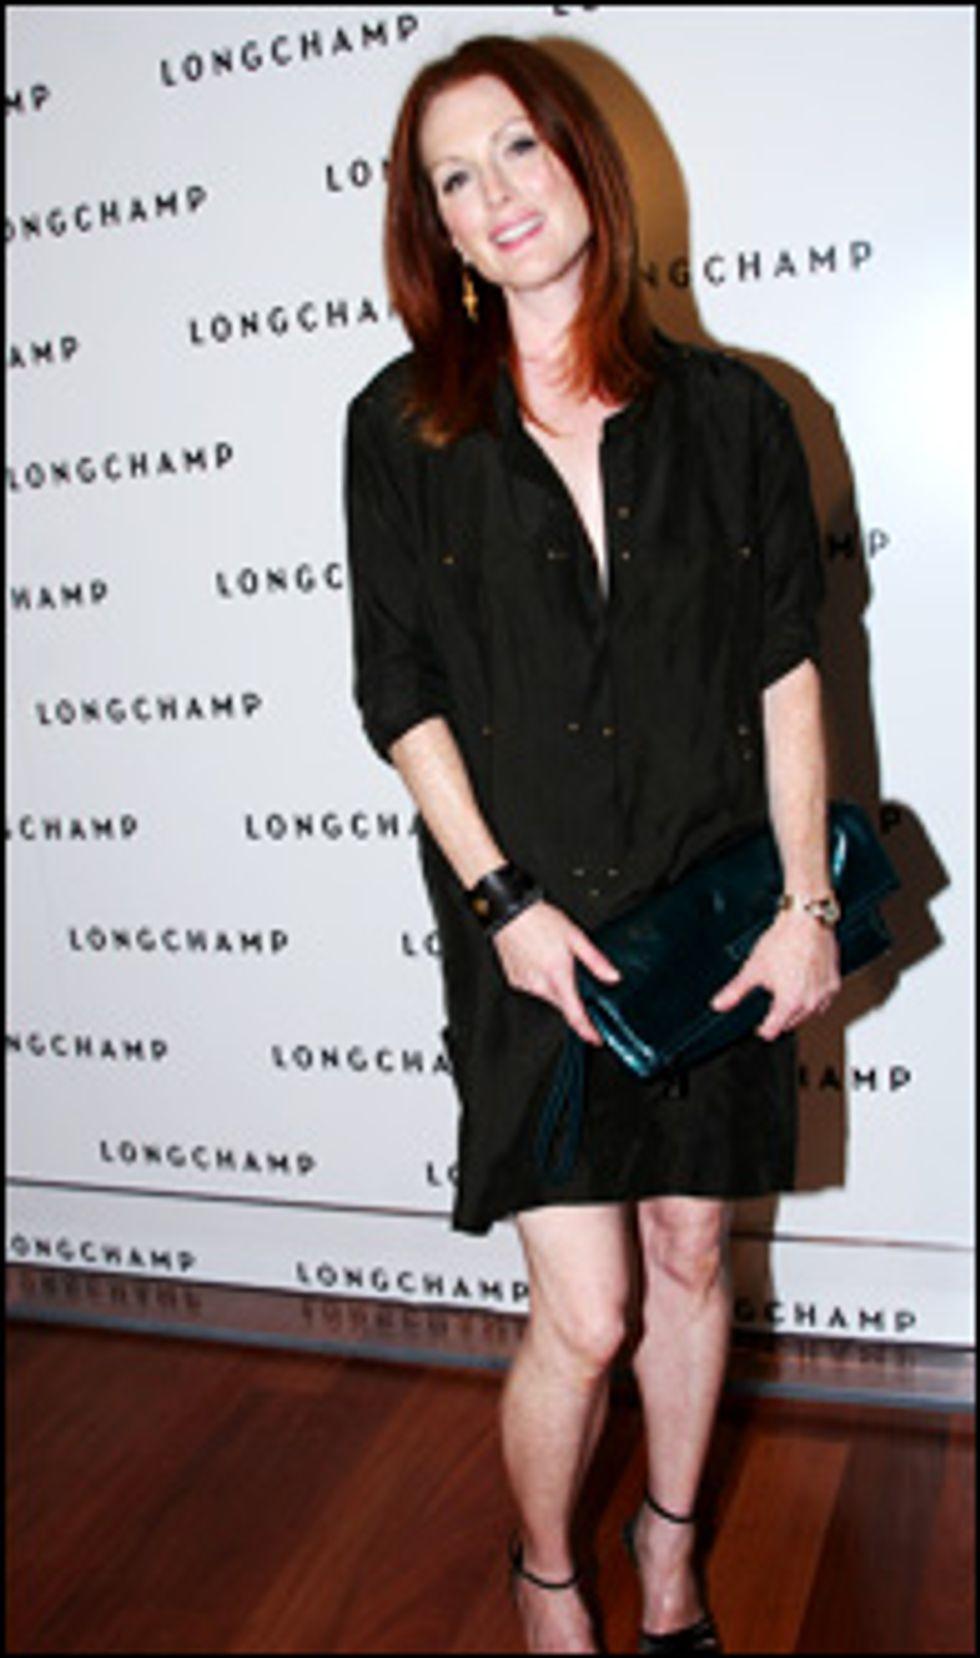 Longchamp's 60th Anniversary Bash